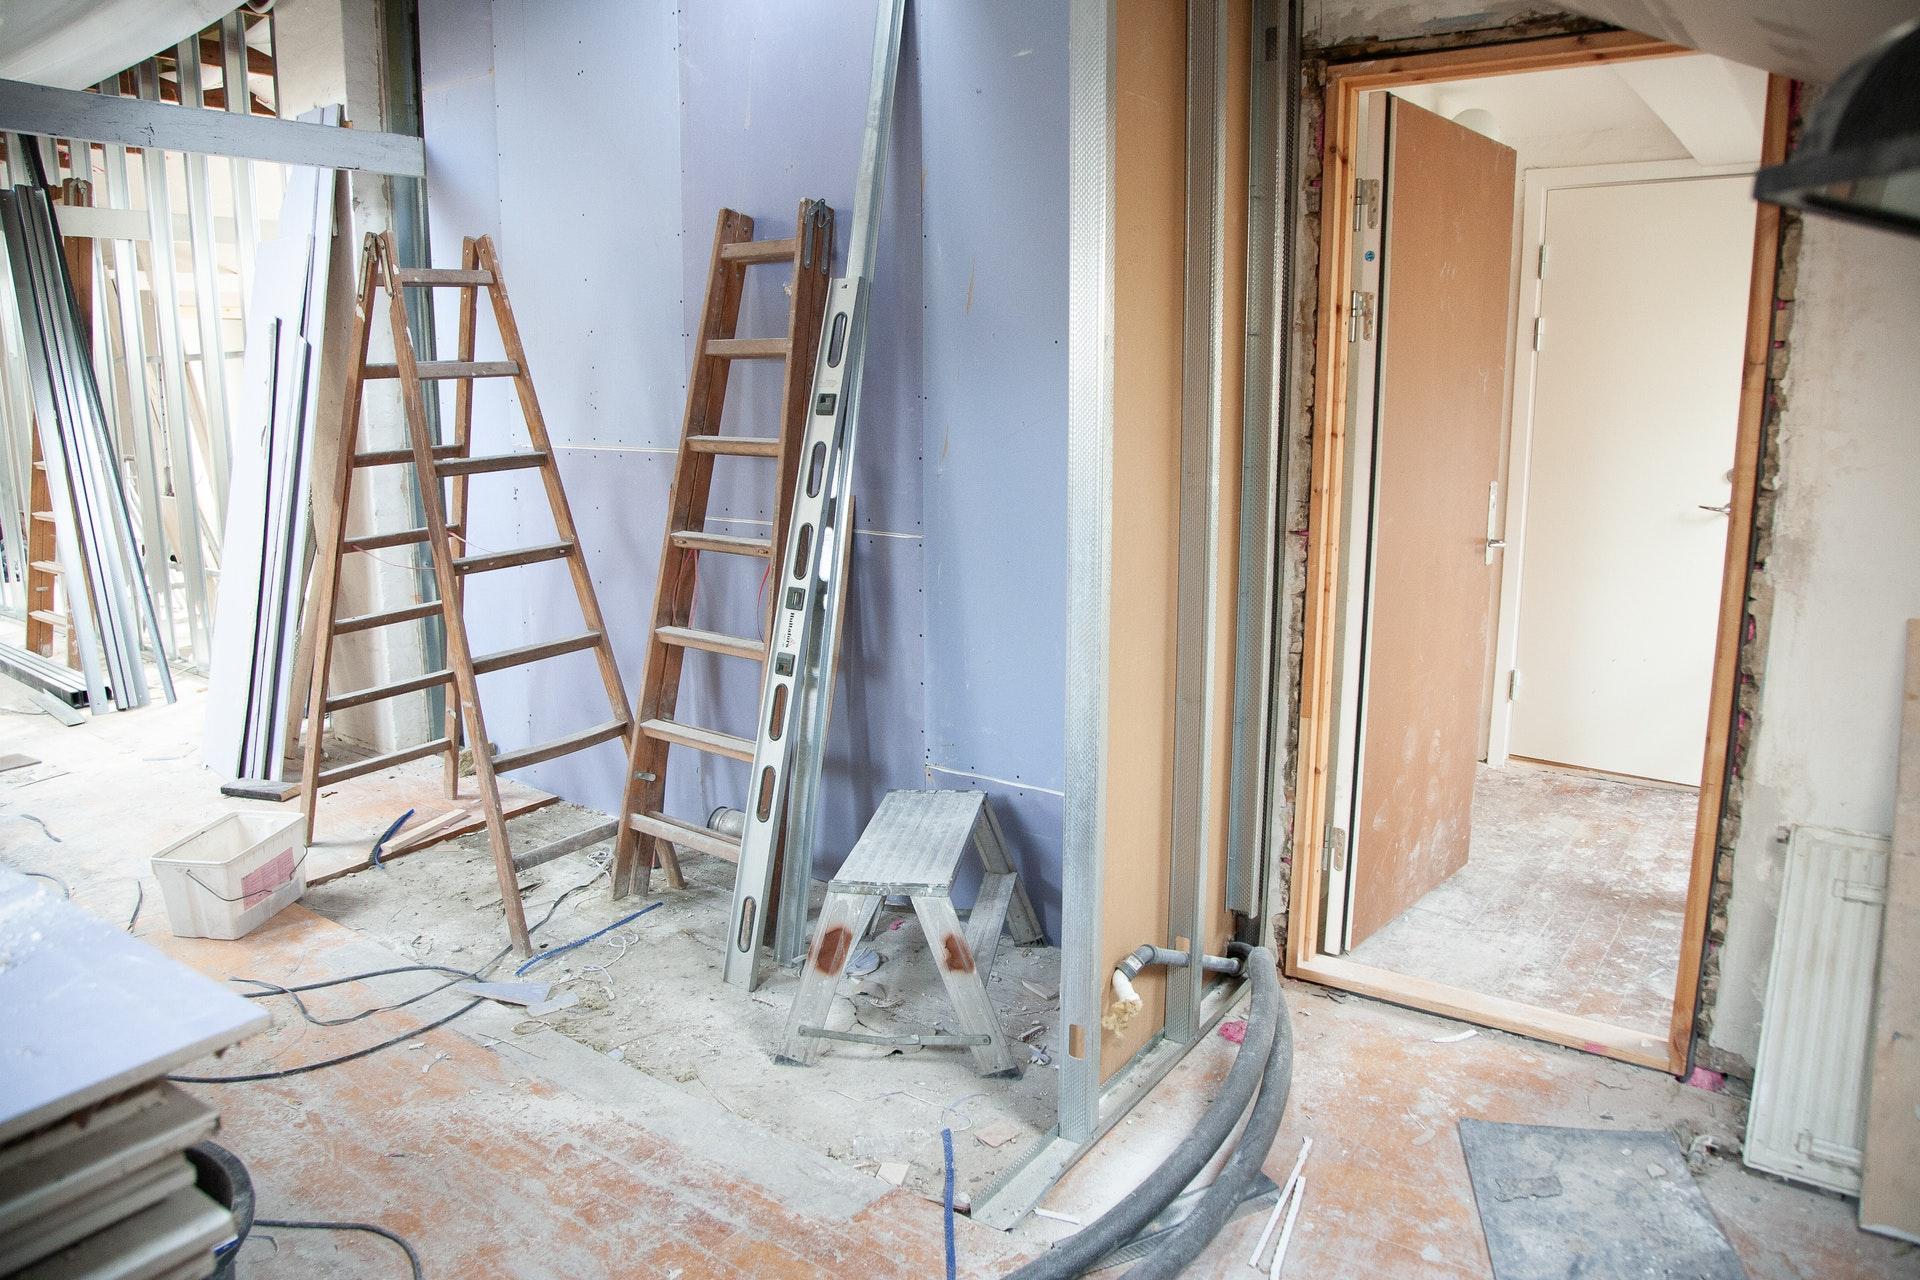 Home Remodeling Spikes During Coronavirus Pandemic